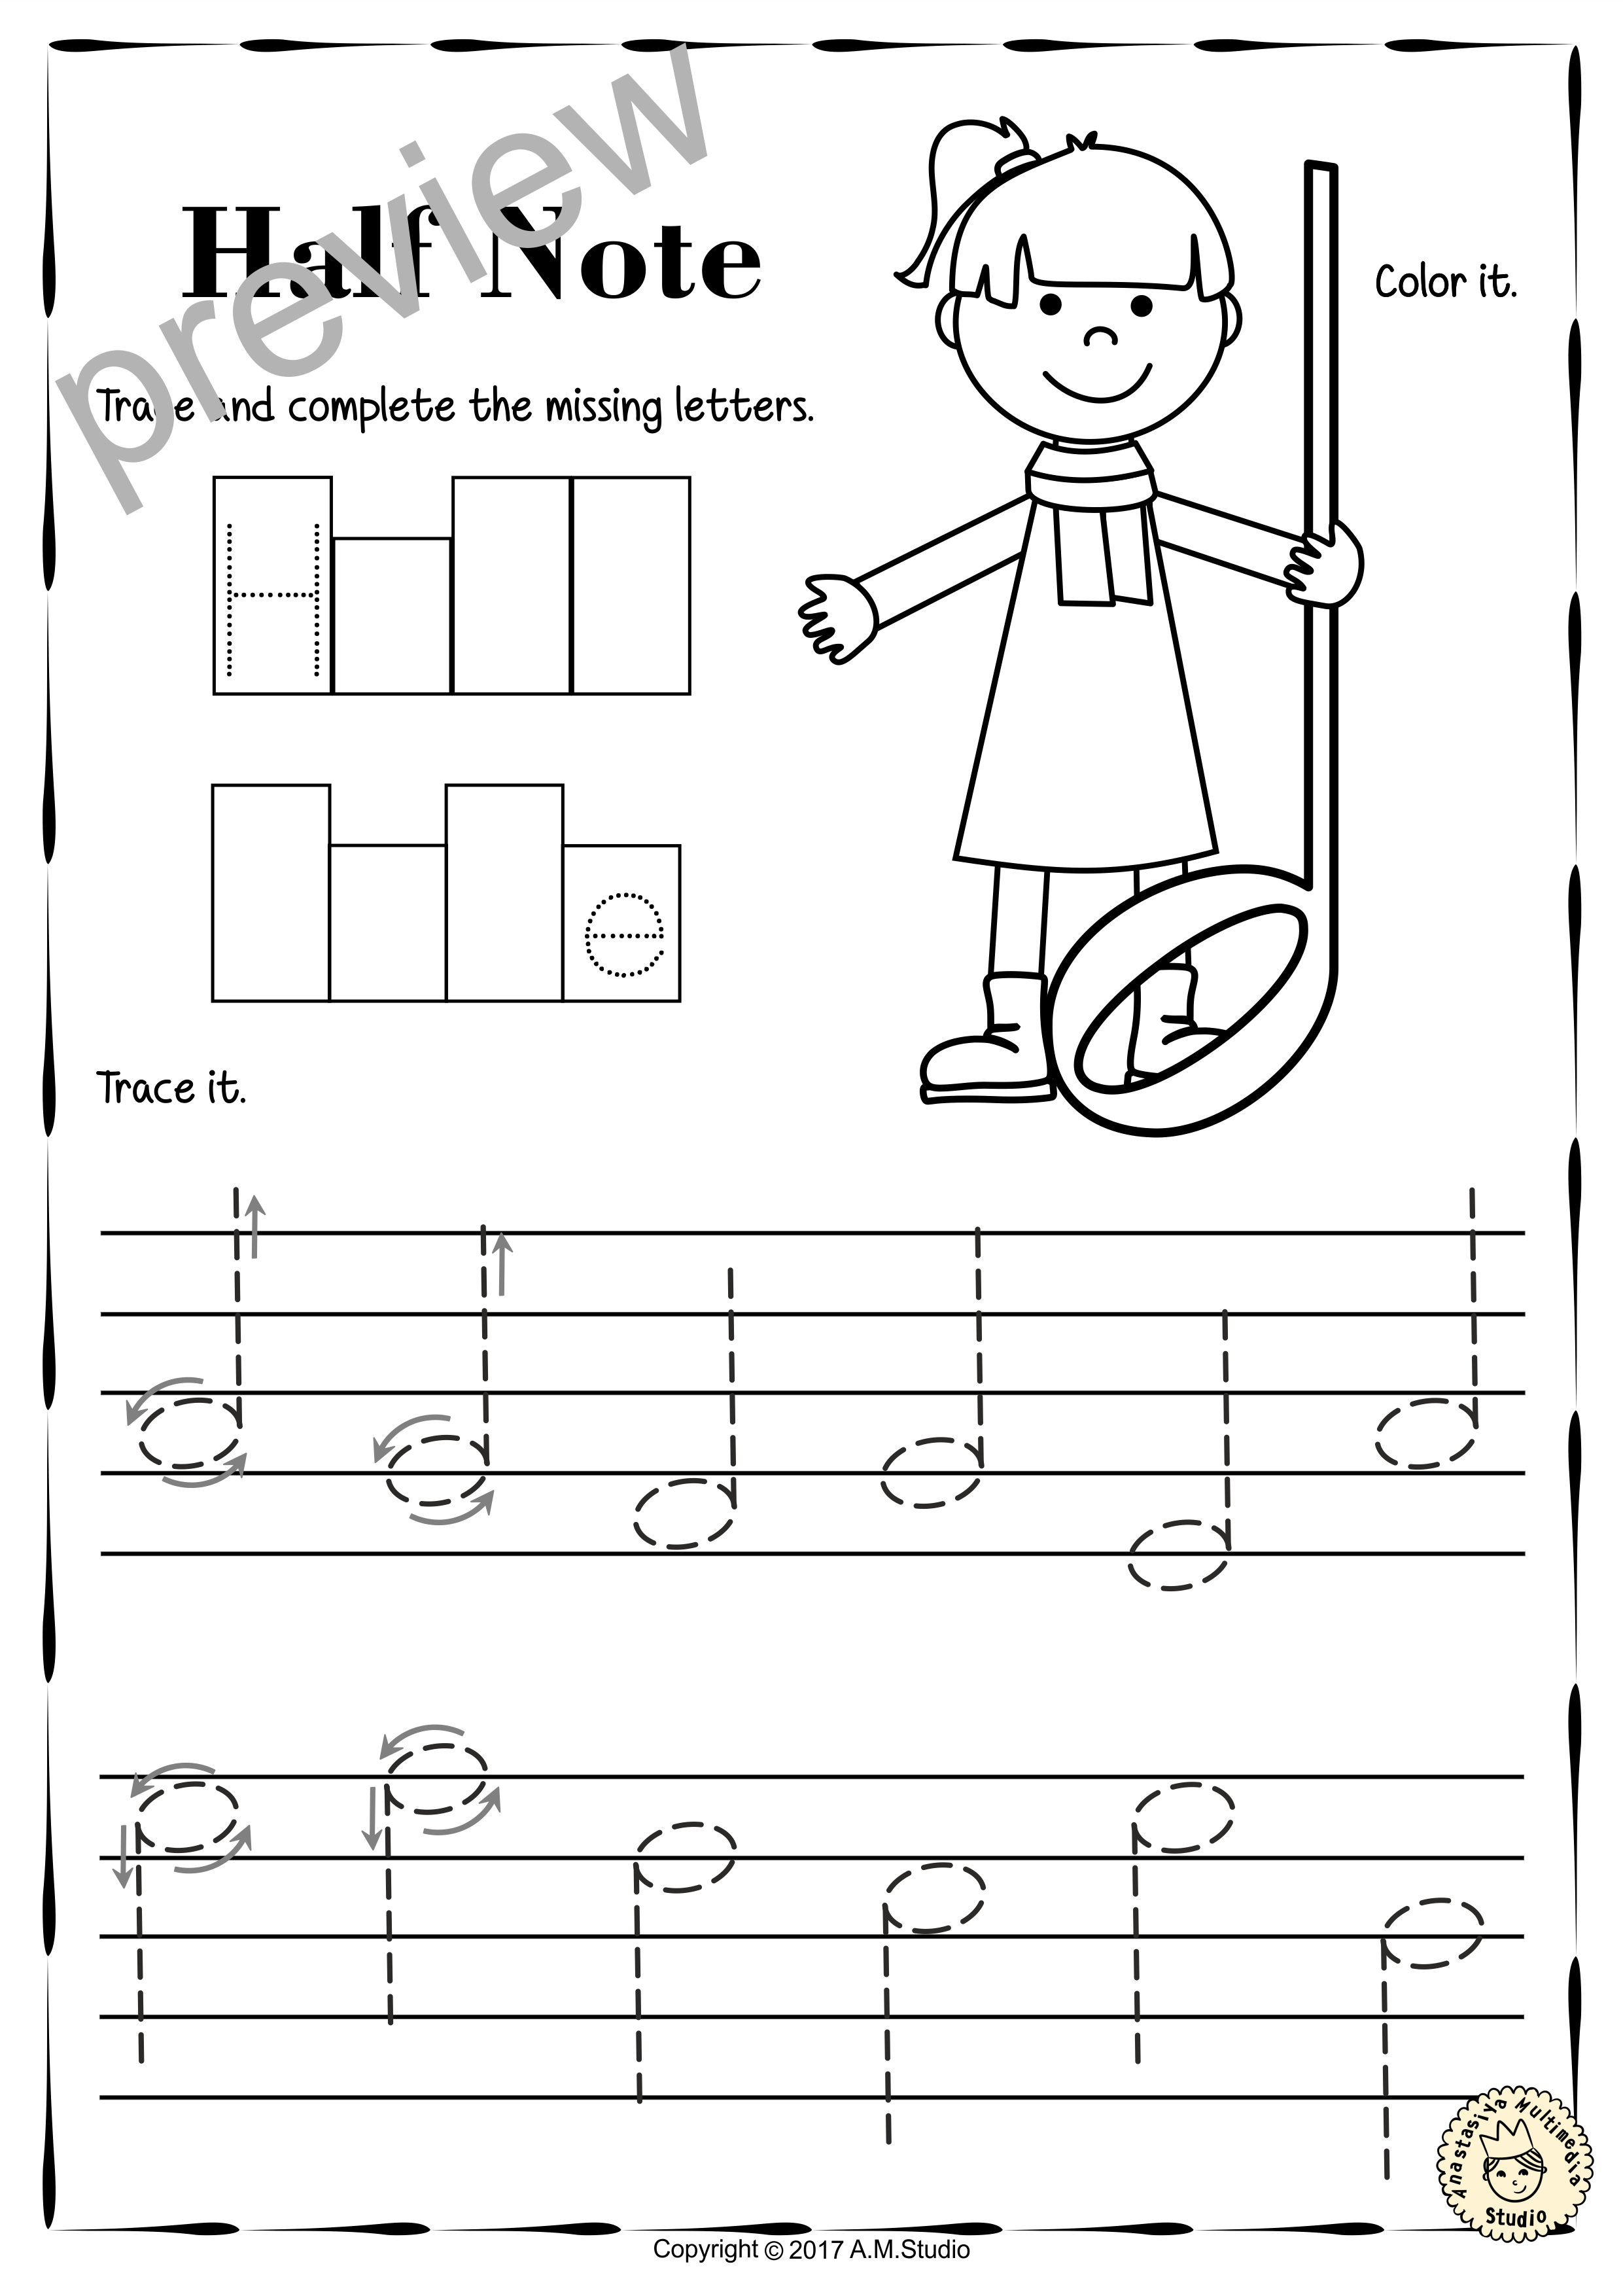 Tracing Music Notes Worksheets For Kids4  Anastasiya Multimedia Studio For Music Worksheets For Kids